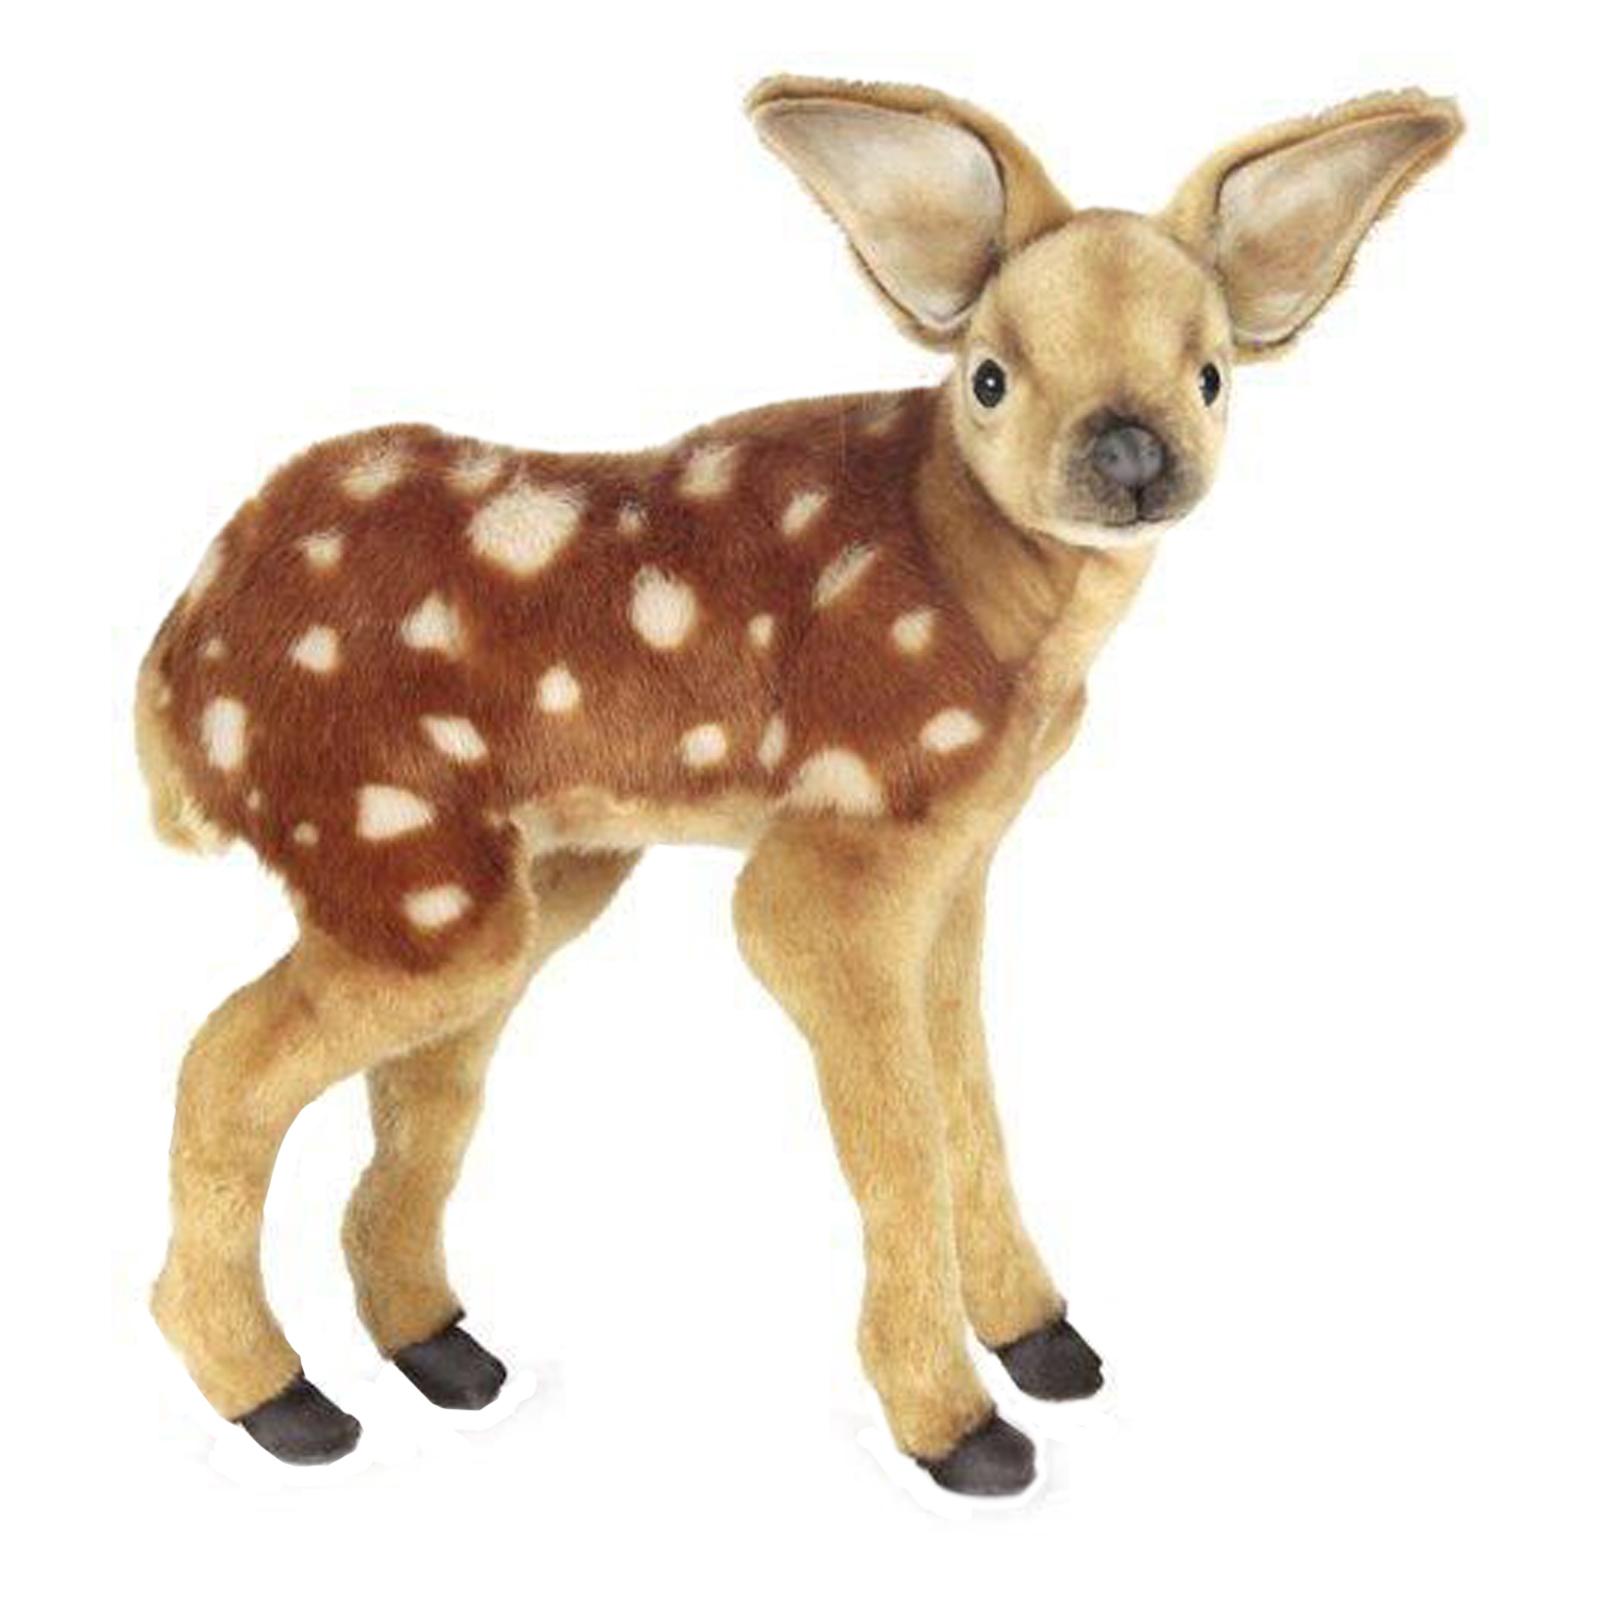 Hansa Bambi Roe Deer Fawn Plush - Toys & Games Stuffed